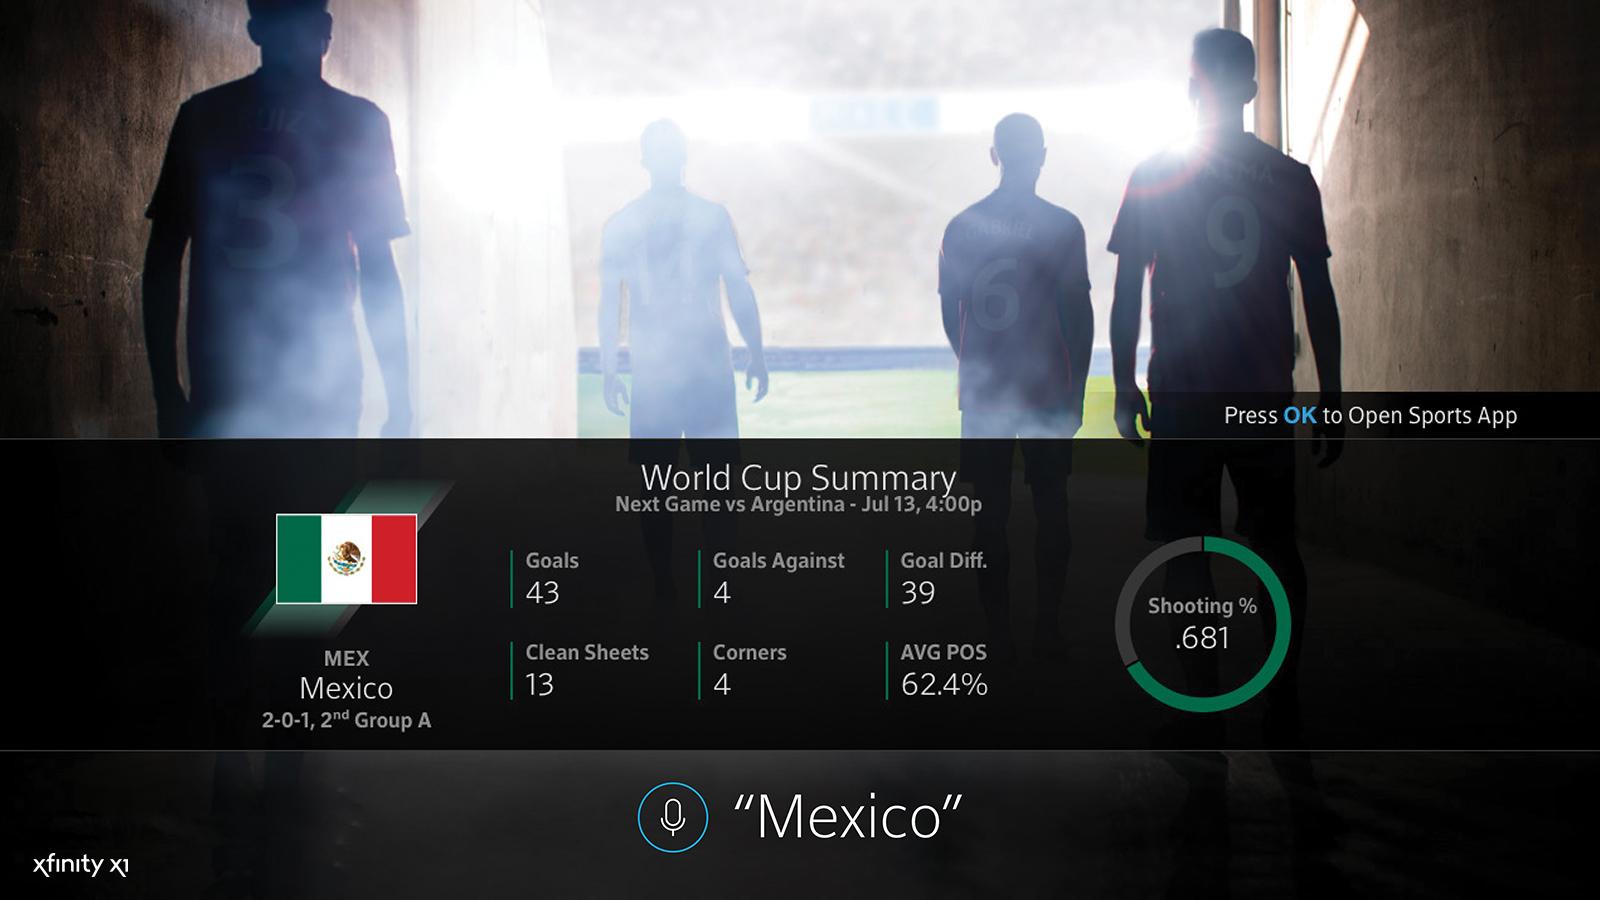 Creative_World Cup UI_Sports Voice_Full_16x9.jpg